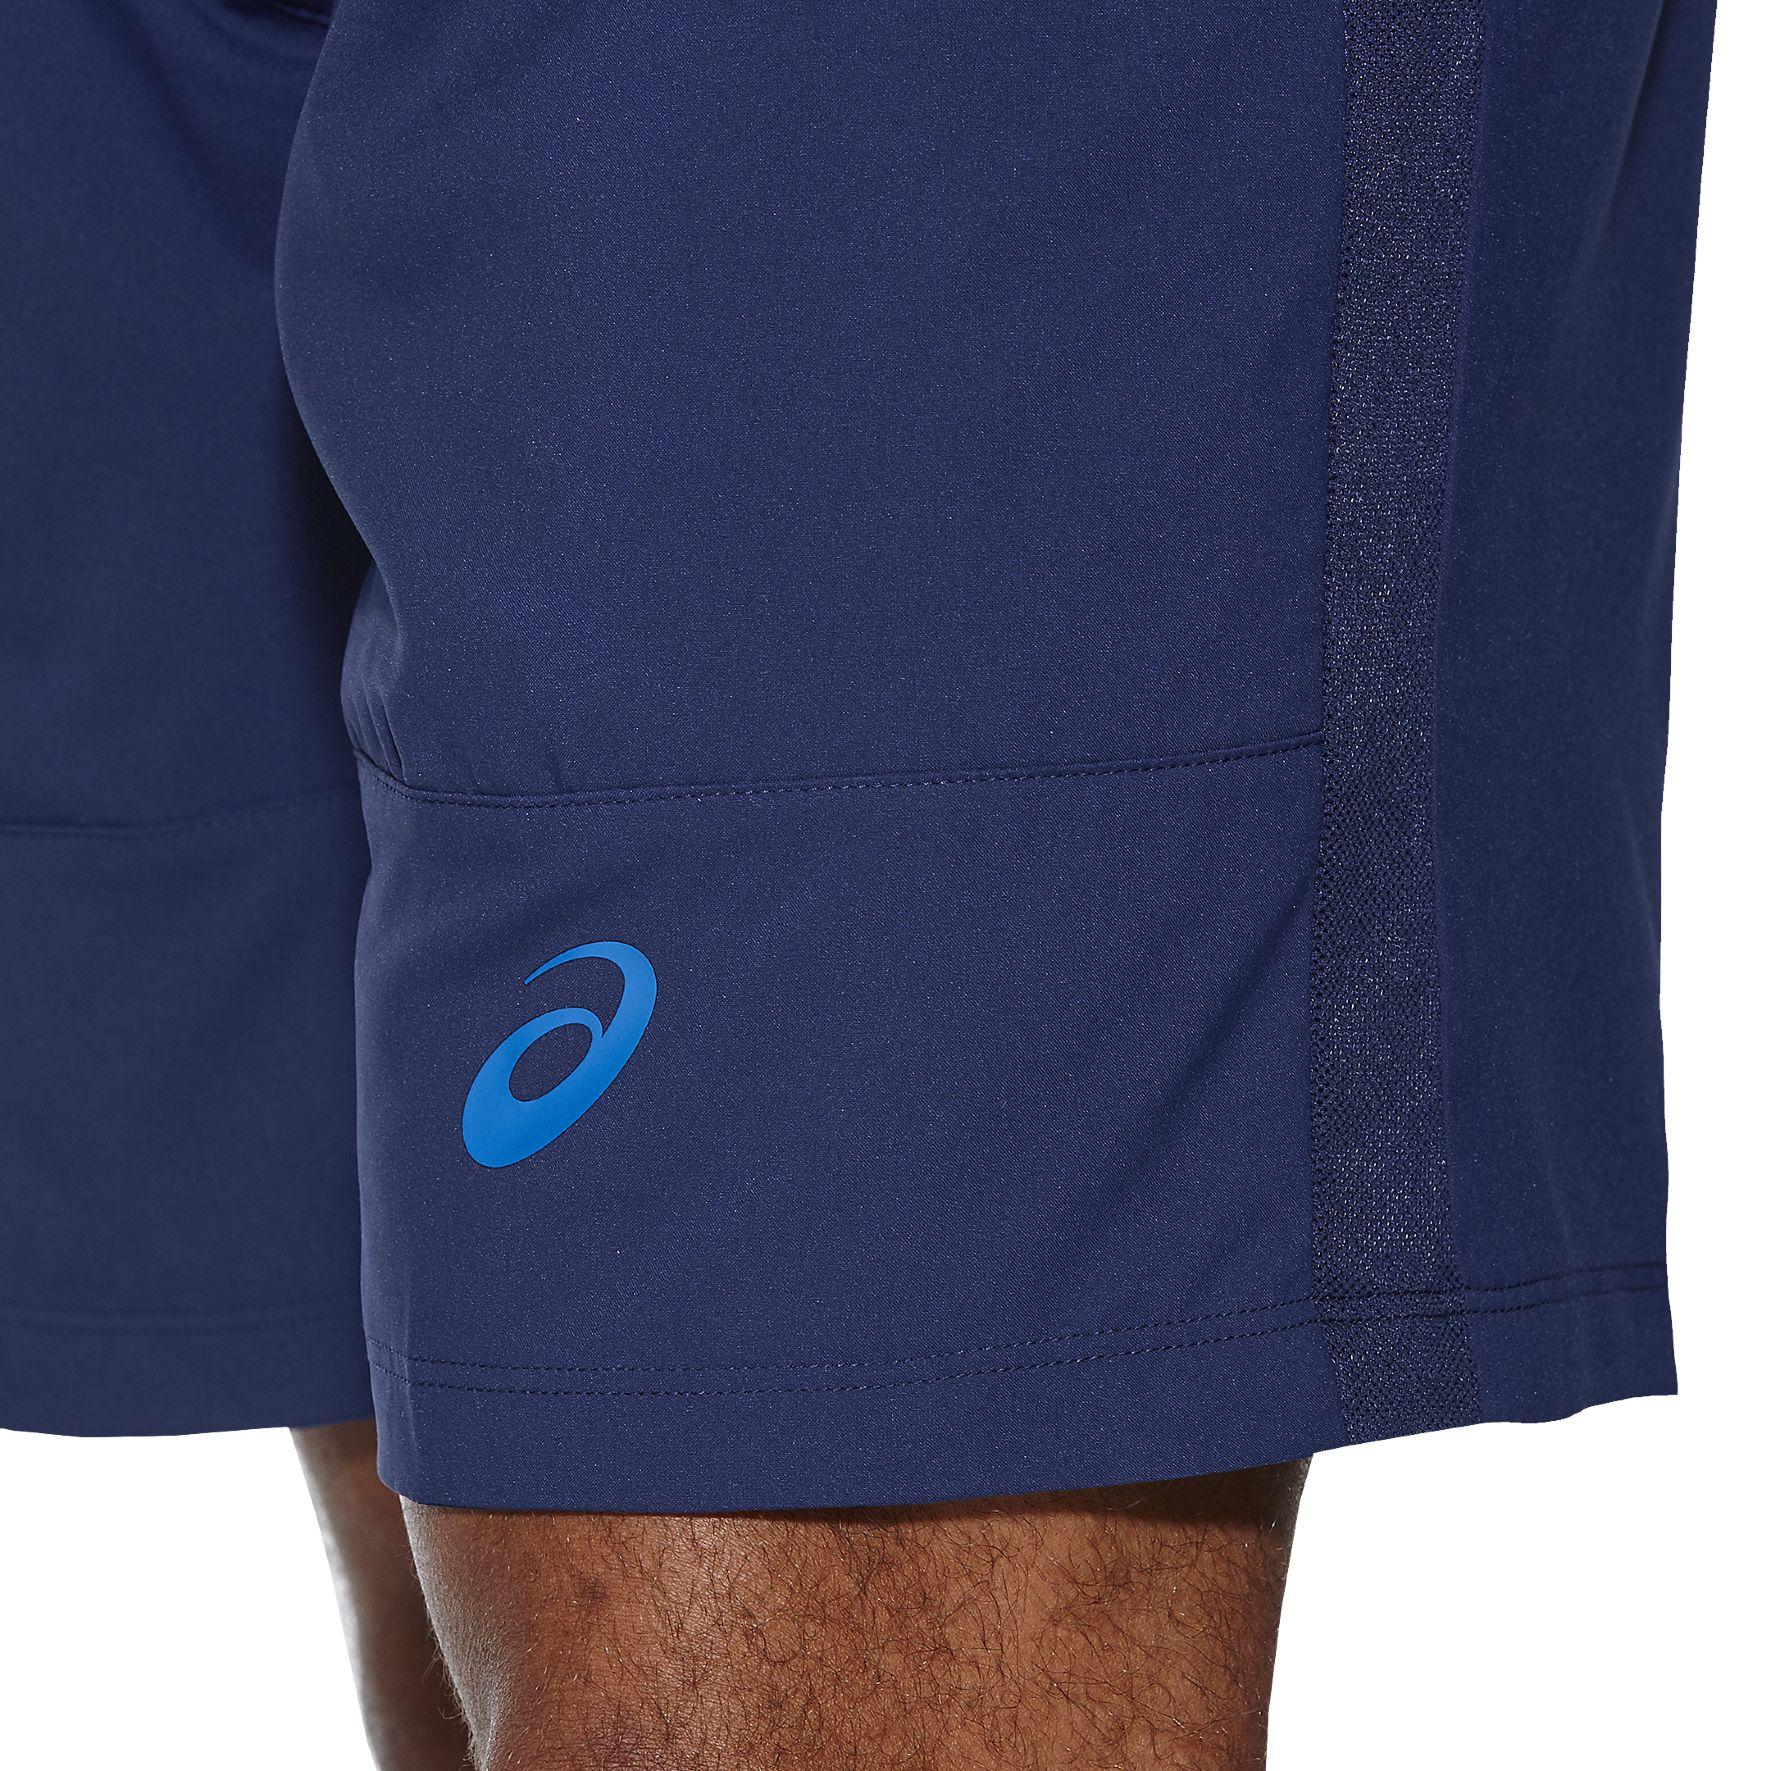 Asics Club 7 Inches Mens Tennis Shorts